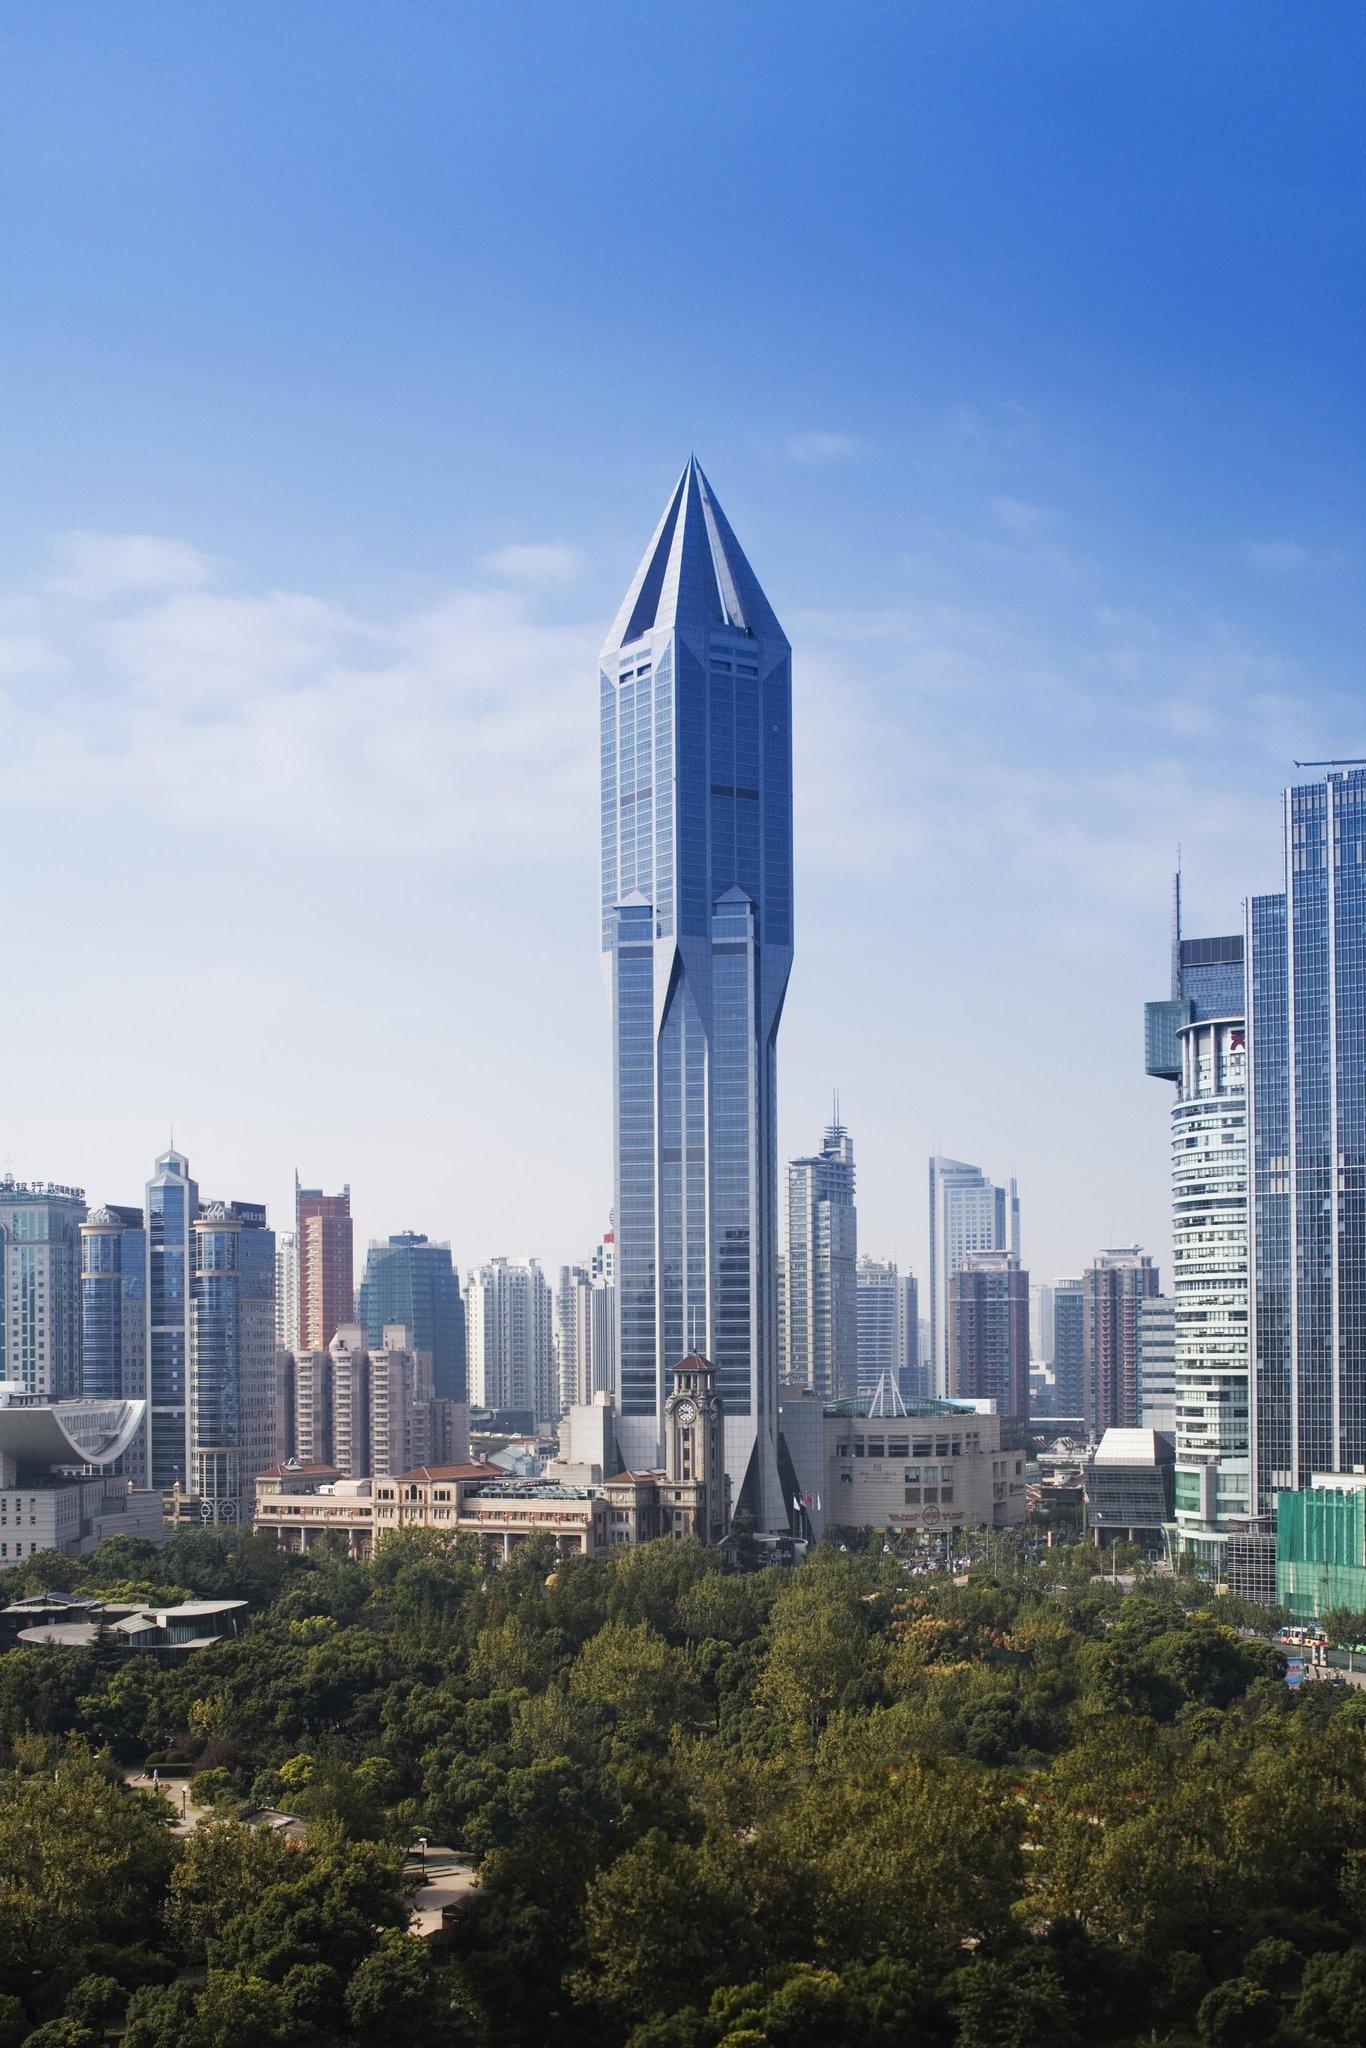 JW Marriott Hotel Shanghai at Tomorrow Square